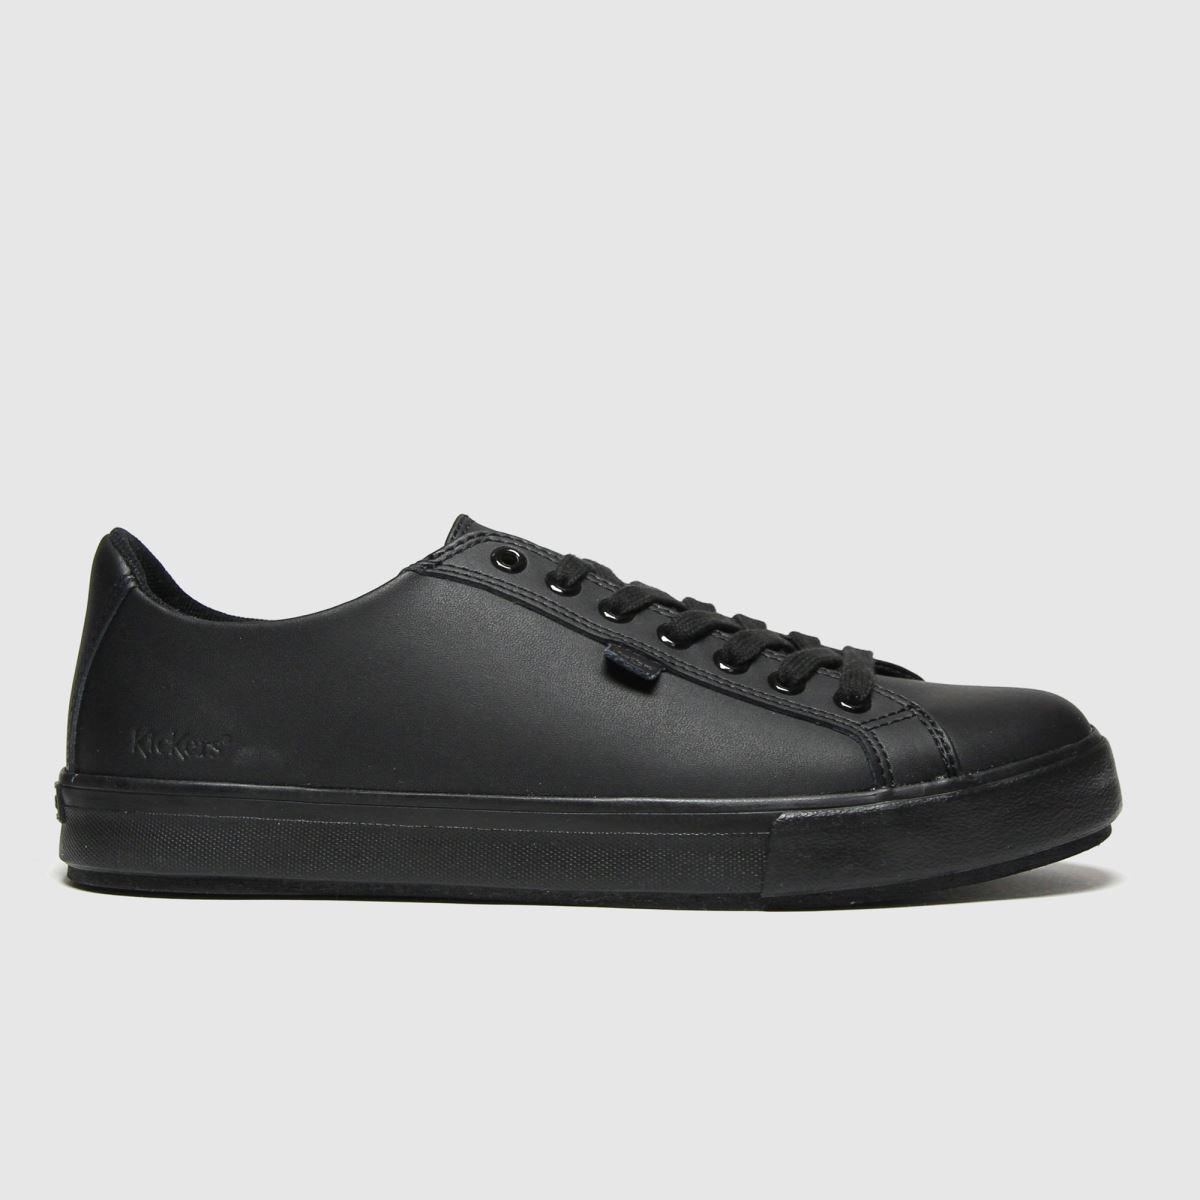 Kickers Black Tovni Lacer Mono Shoes